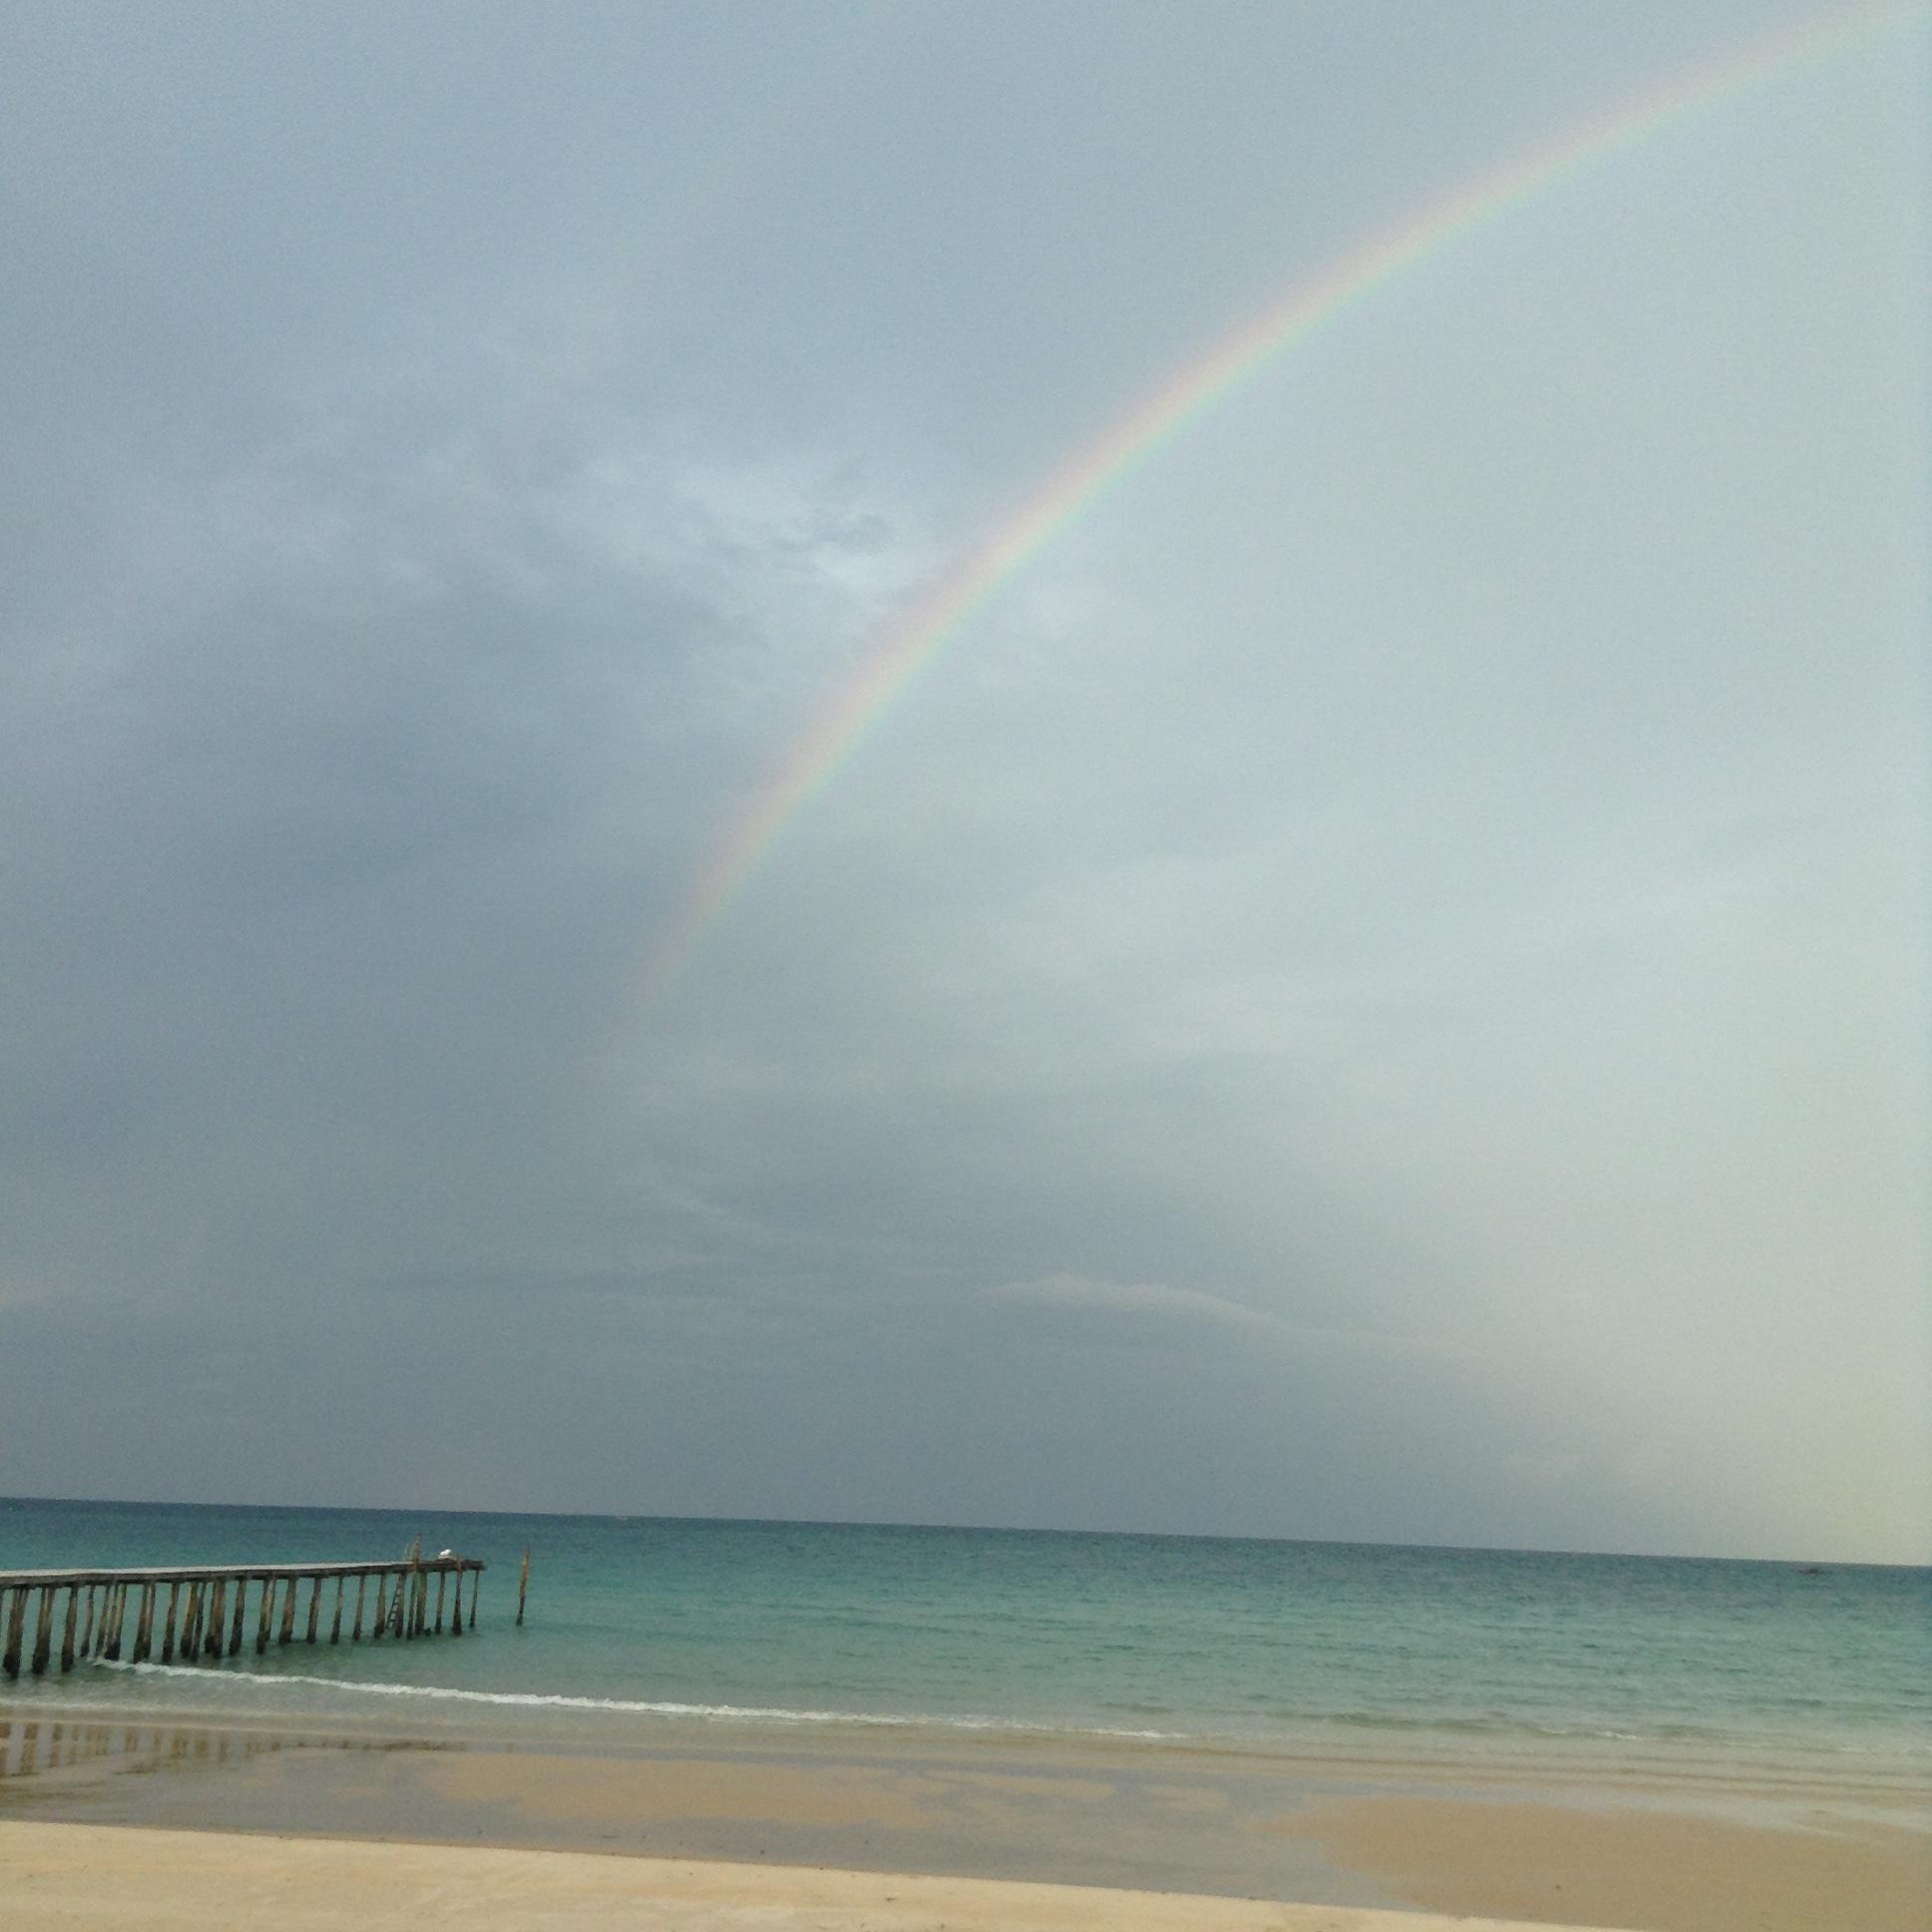 Dockside Rainbow in Koh Rong Samloem, Cambodia